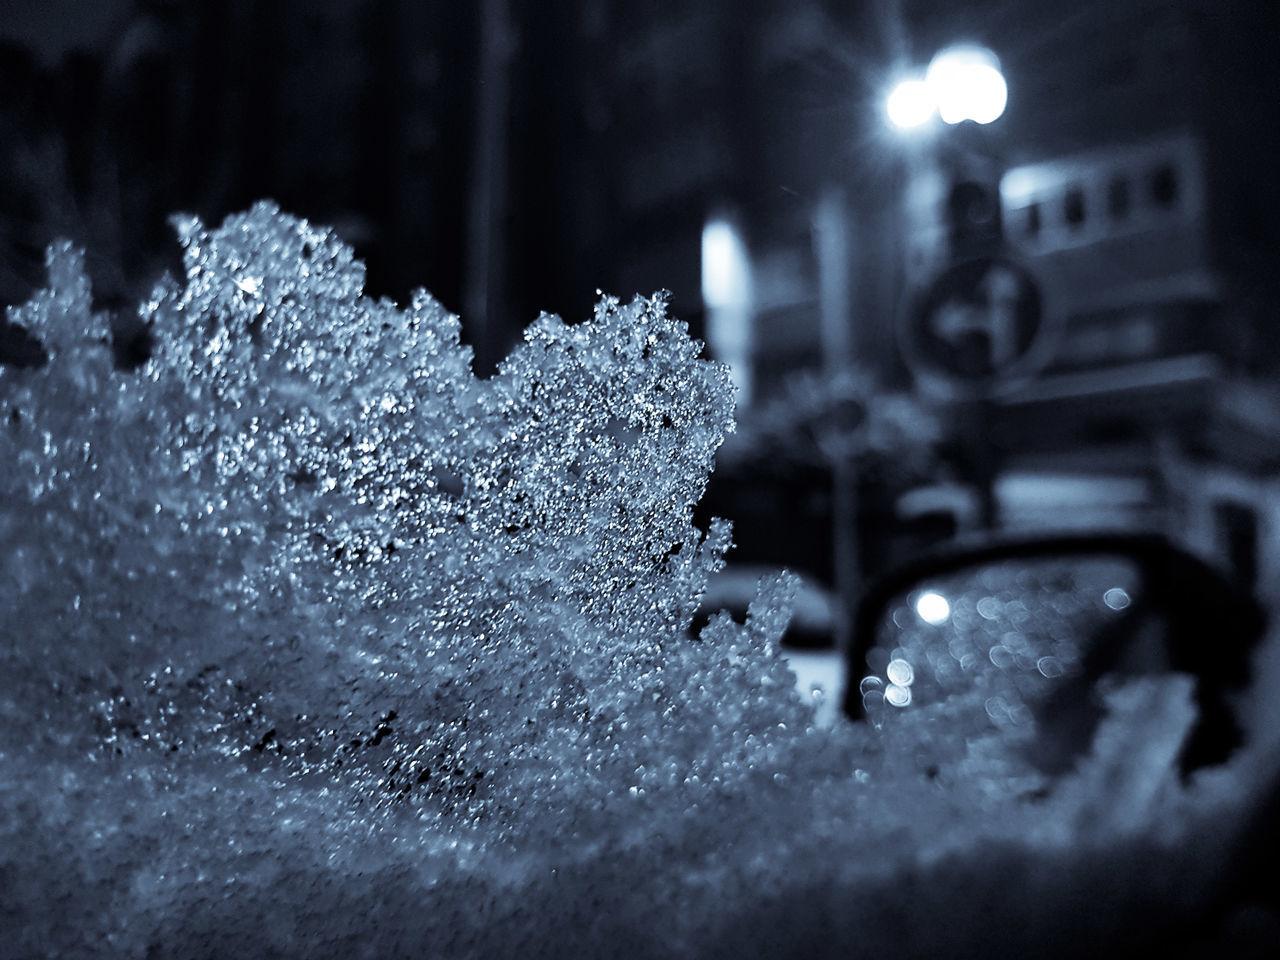 CLOSE-UP OF SNOW ON ILLUMINATED LEAF